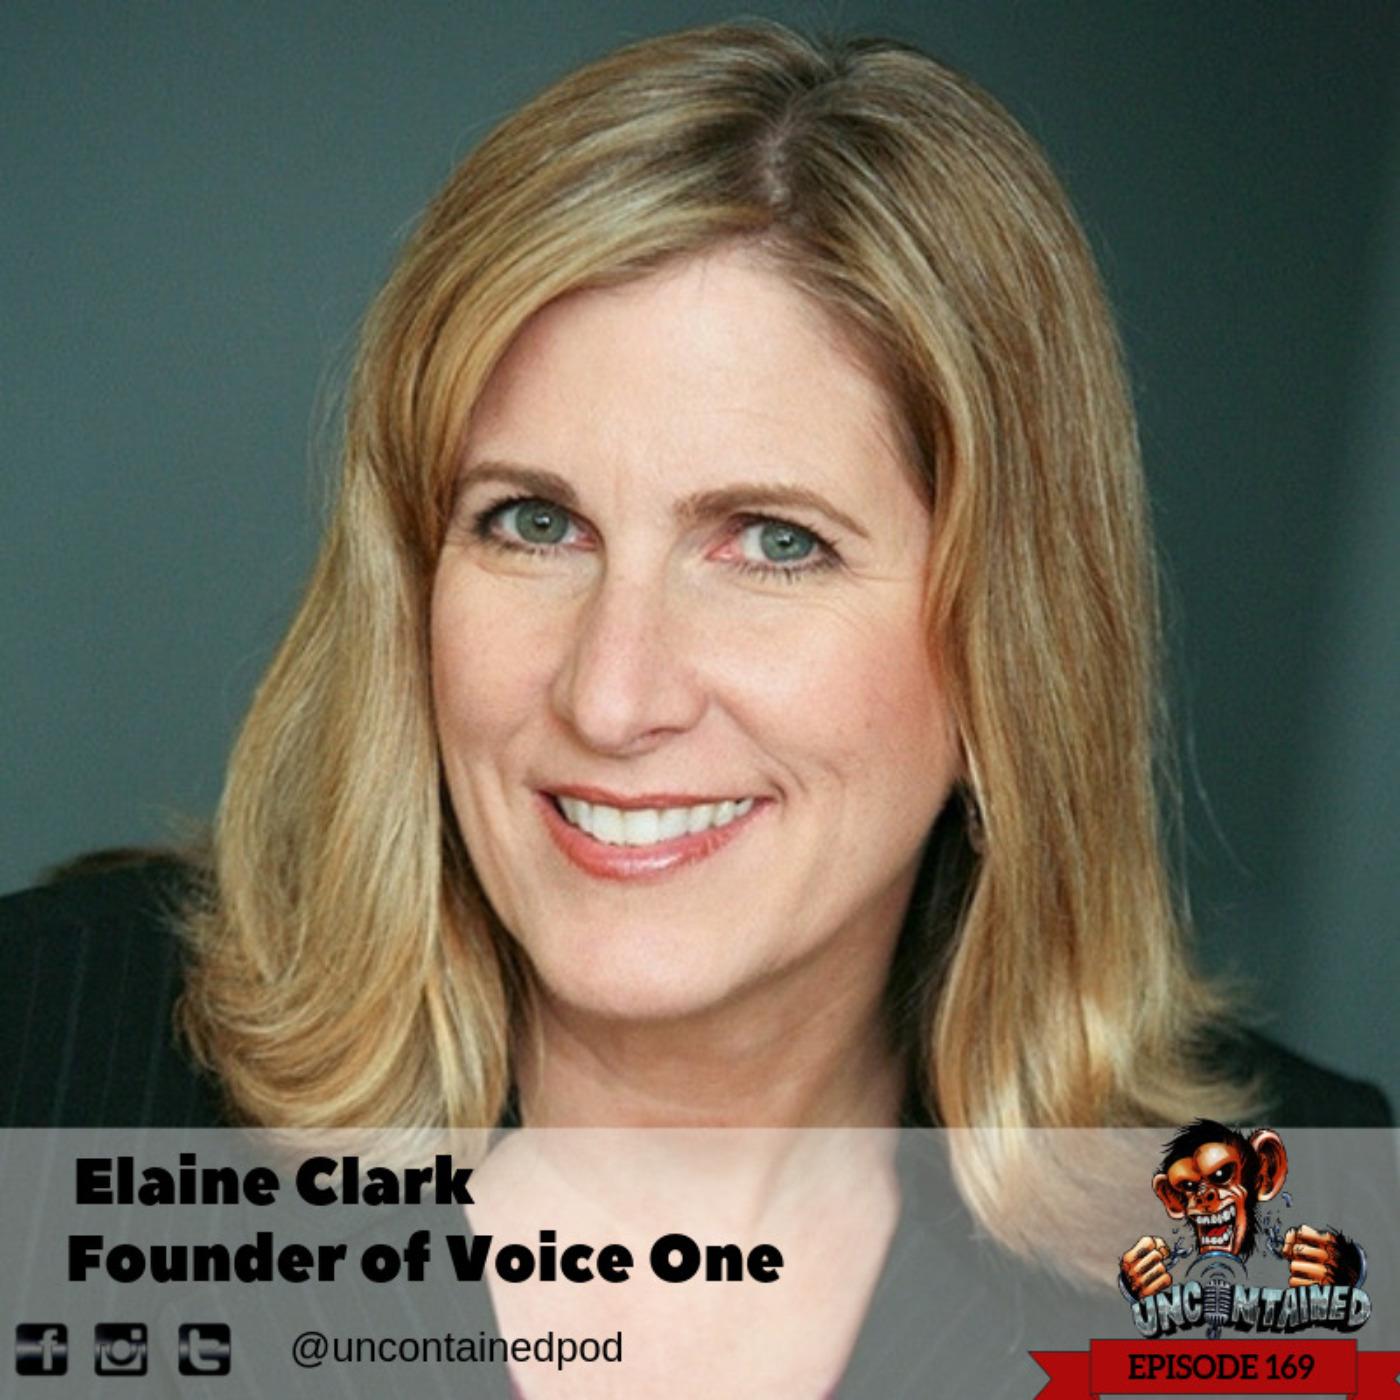 Episode 169: Elaine Clarke -Founder of Voice One